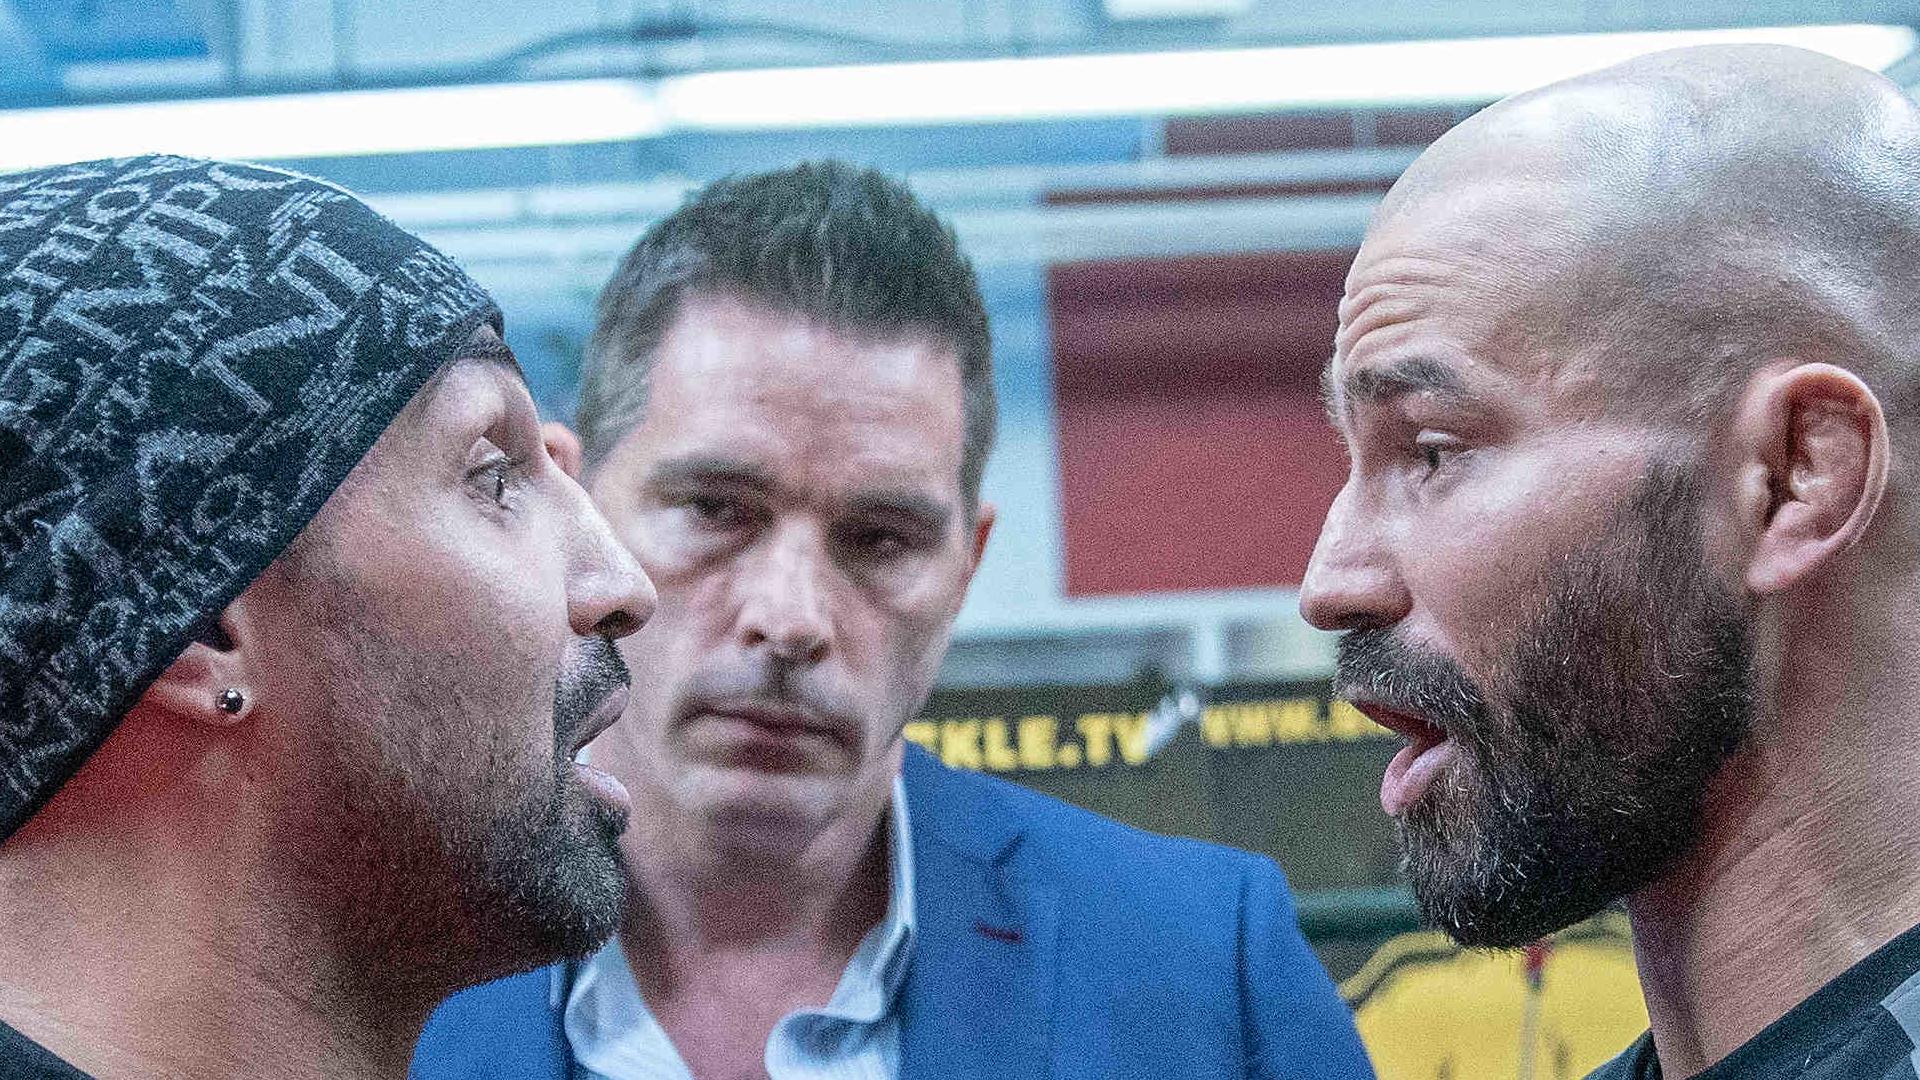 Bare Knuckle Fighting Championship 6: Malignaggi vs. Lobov fight date, time, PPV price, live stream, full card